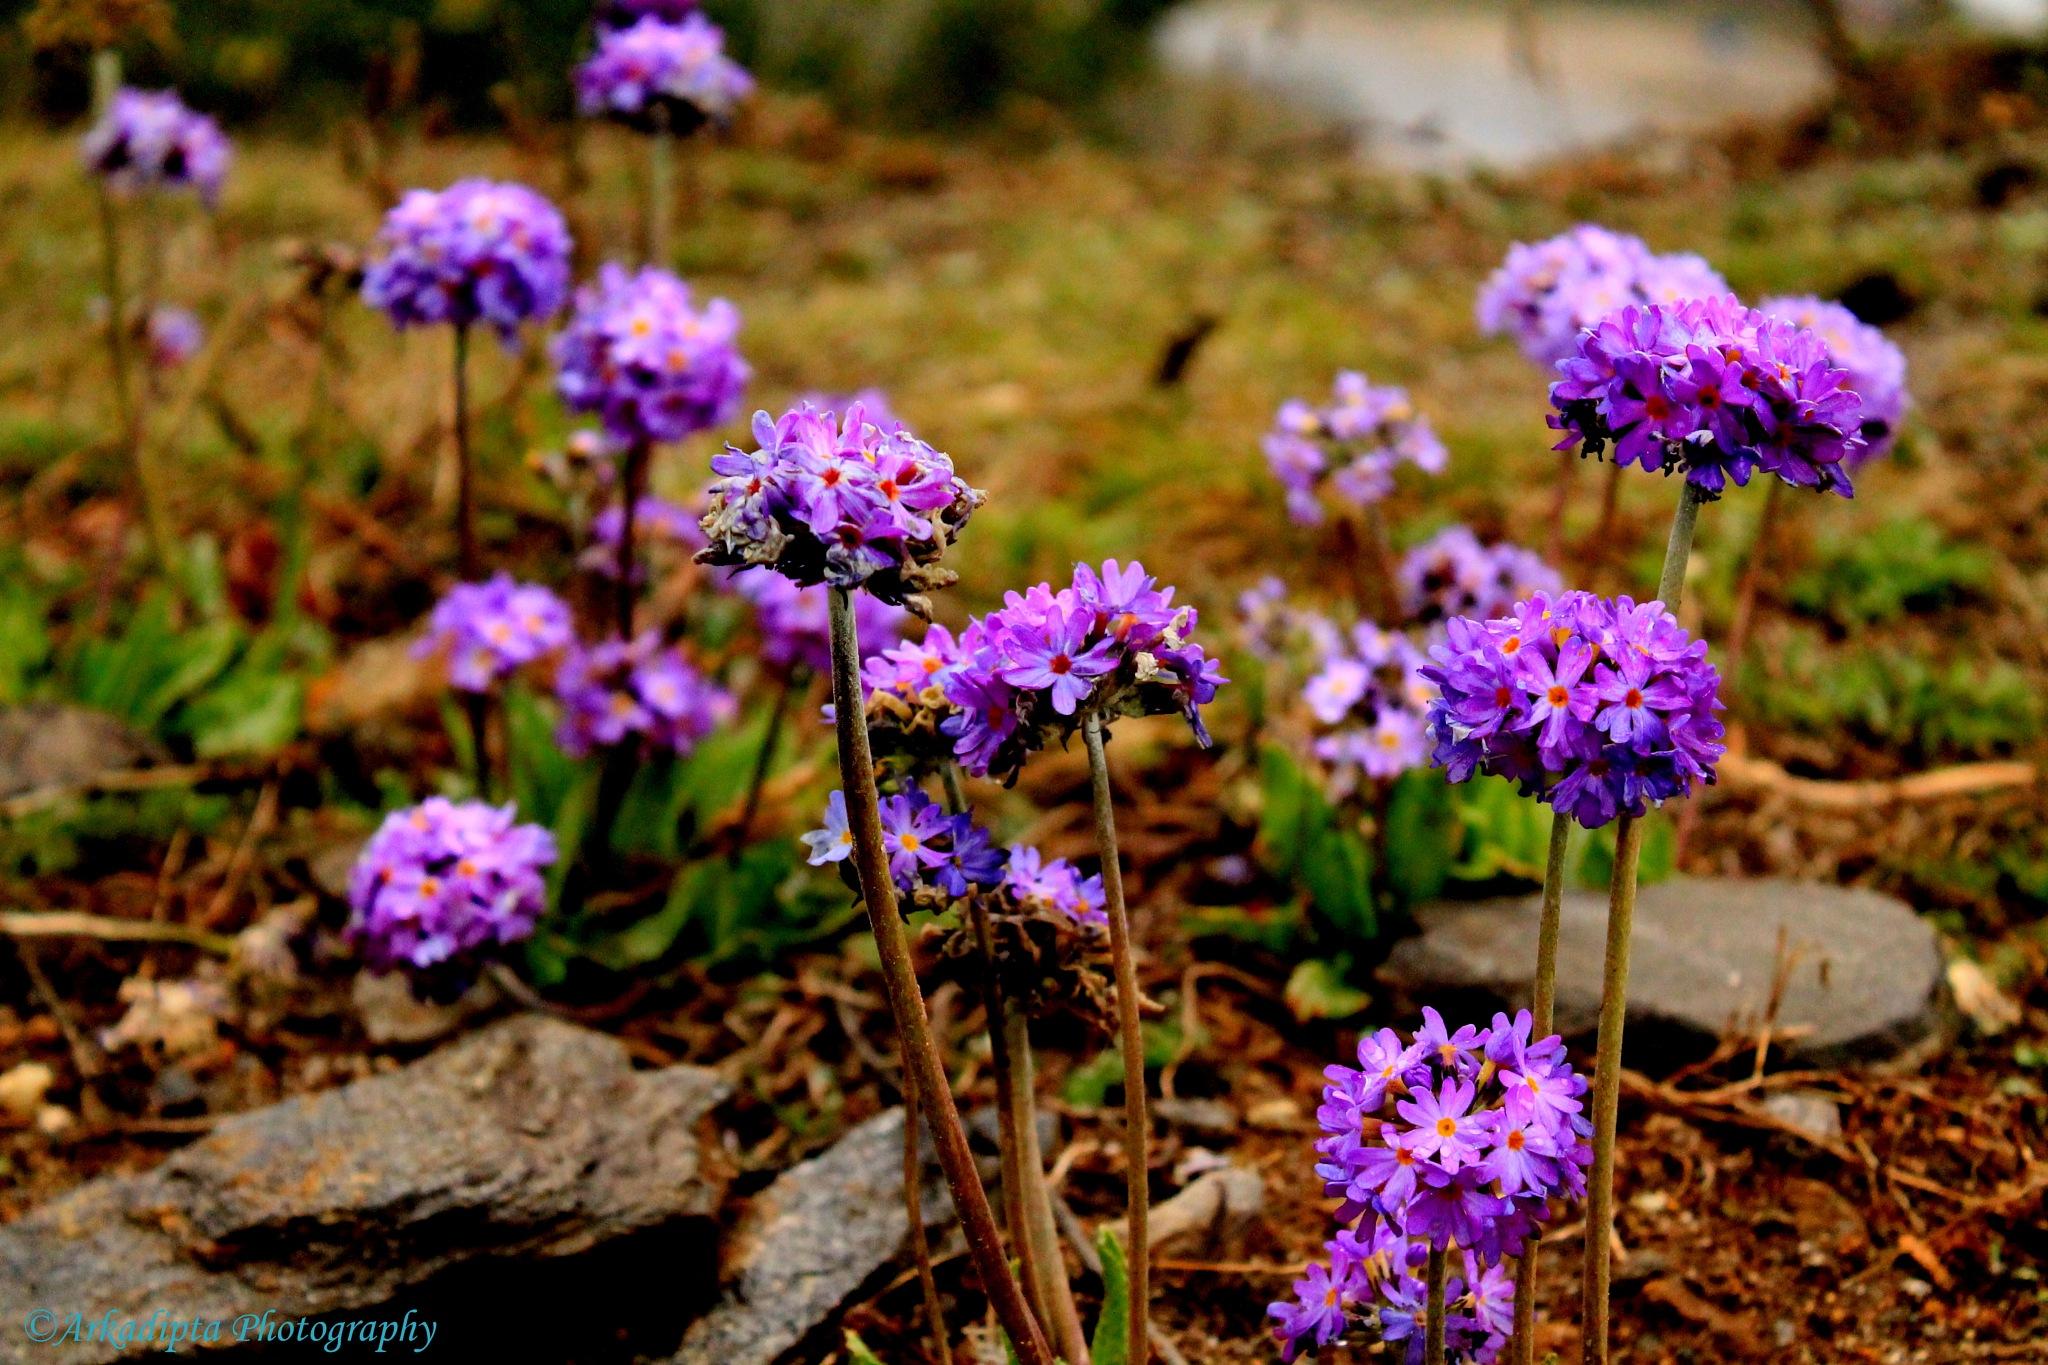 Wild inflorescence flowers by Arkadipta Chandra